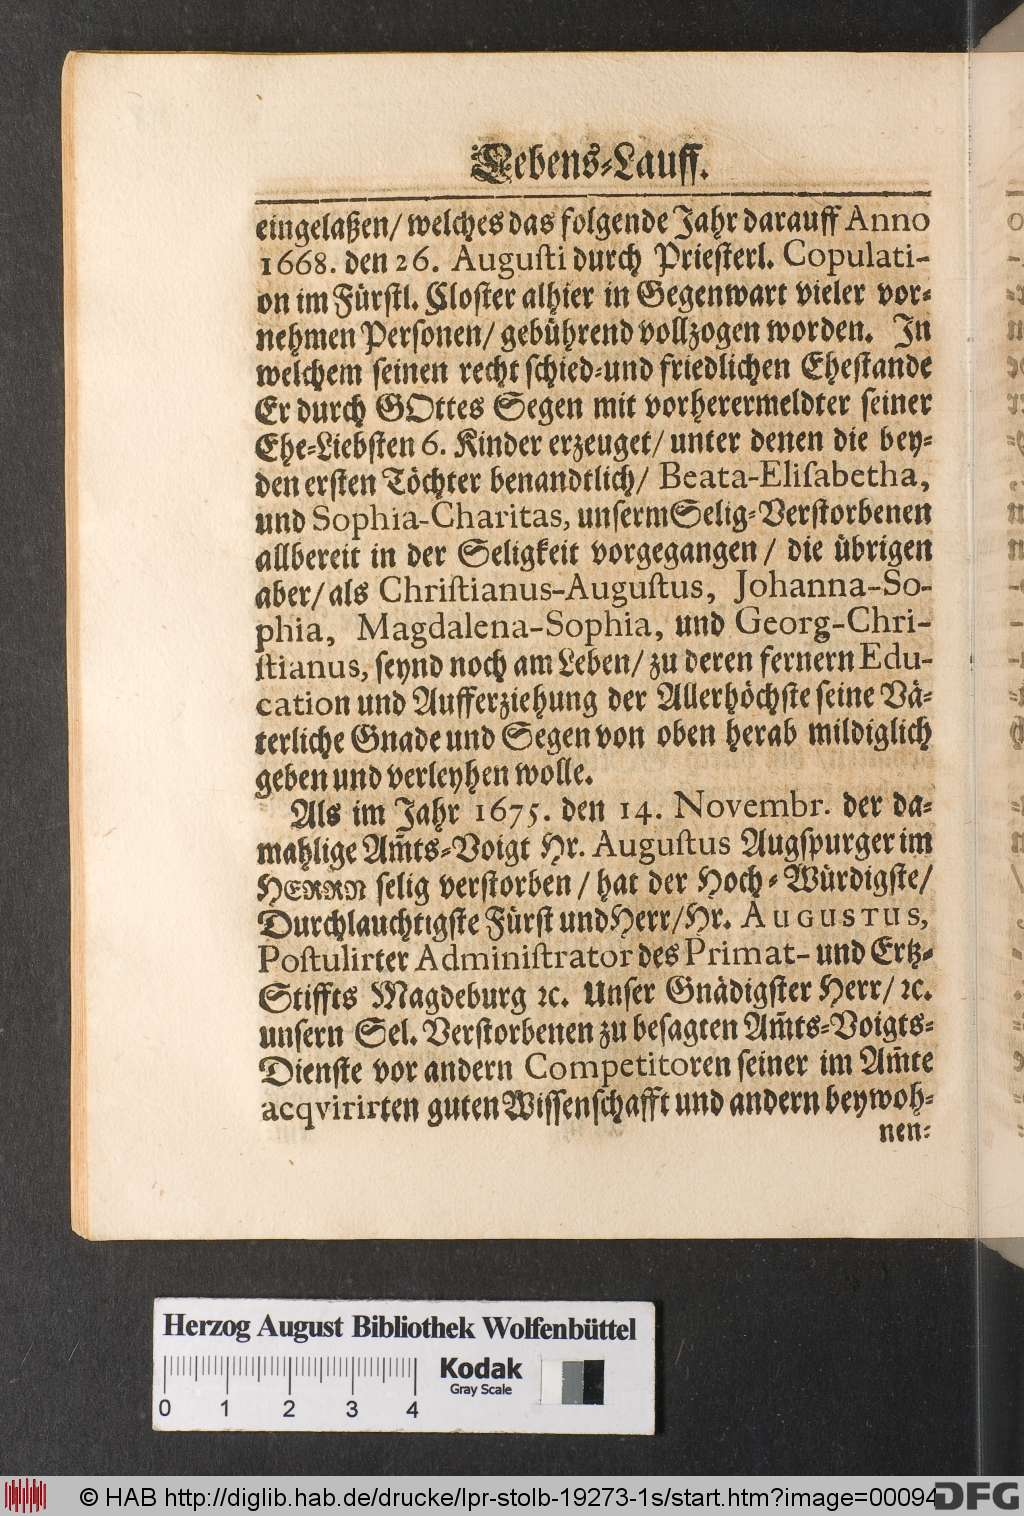 http://diglib.hab.de/drucke/lpr-stolb-19273-1s/00094.jpg